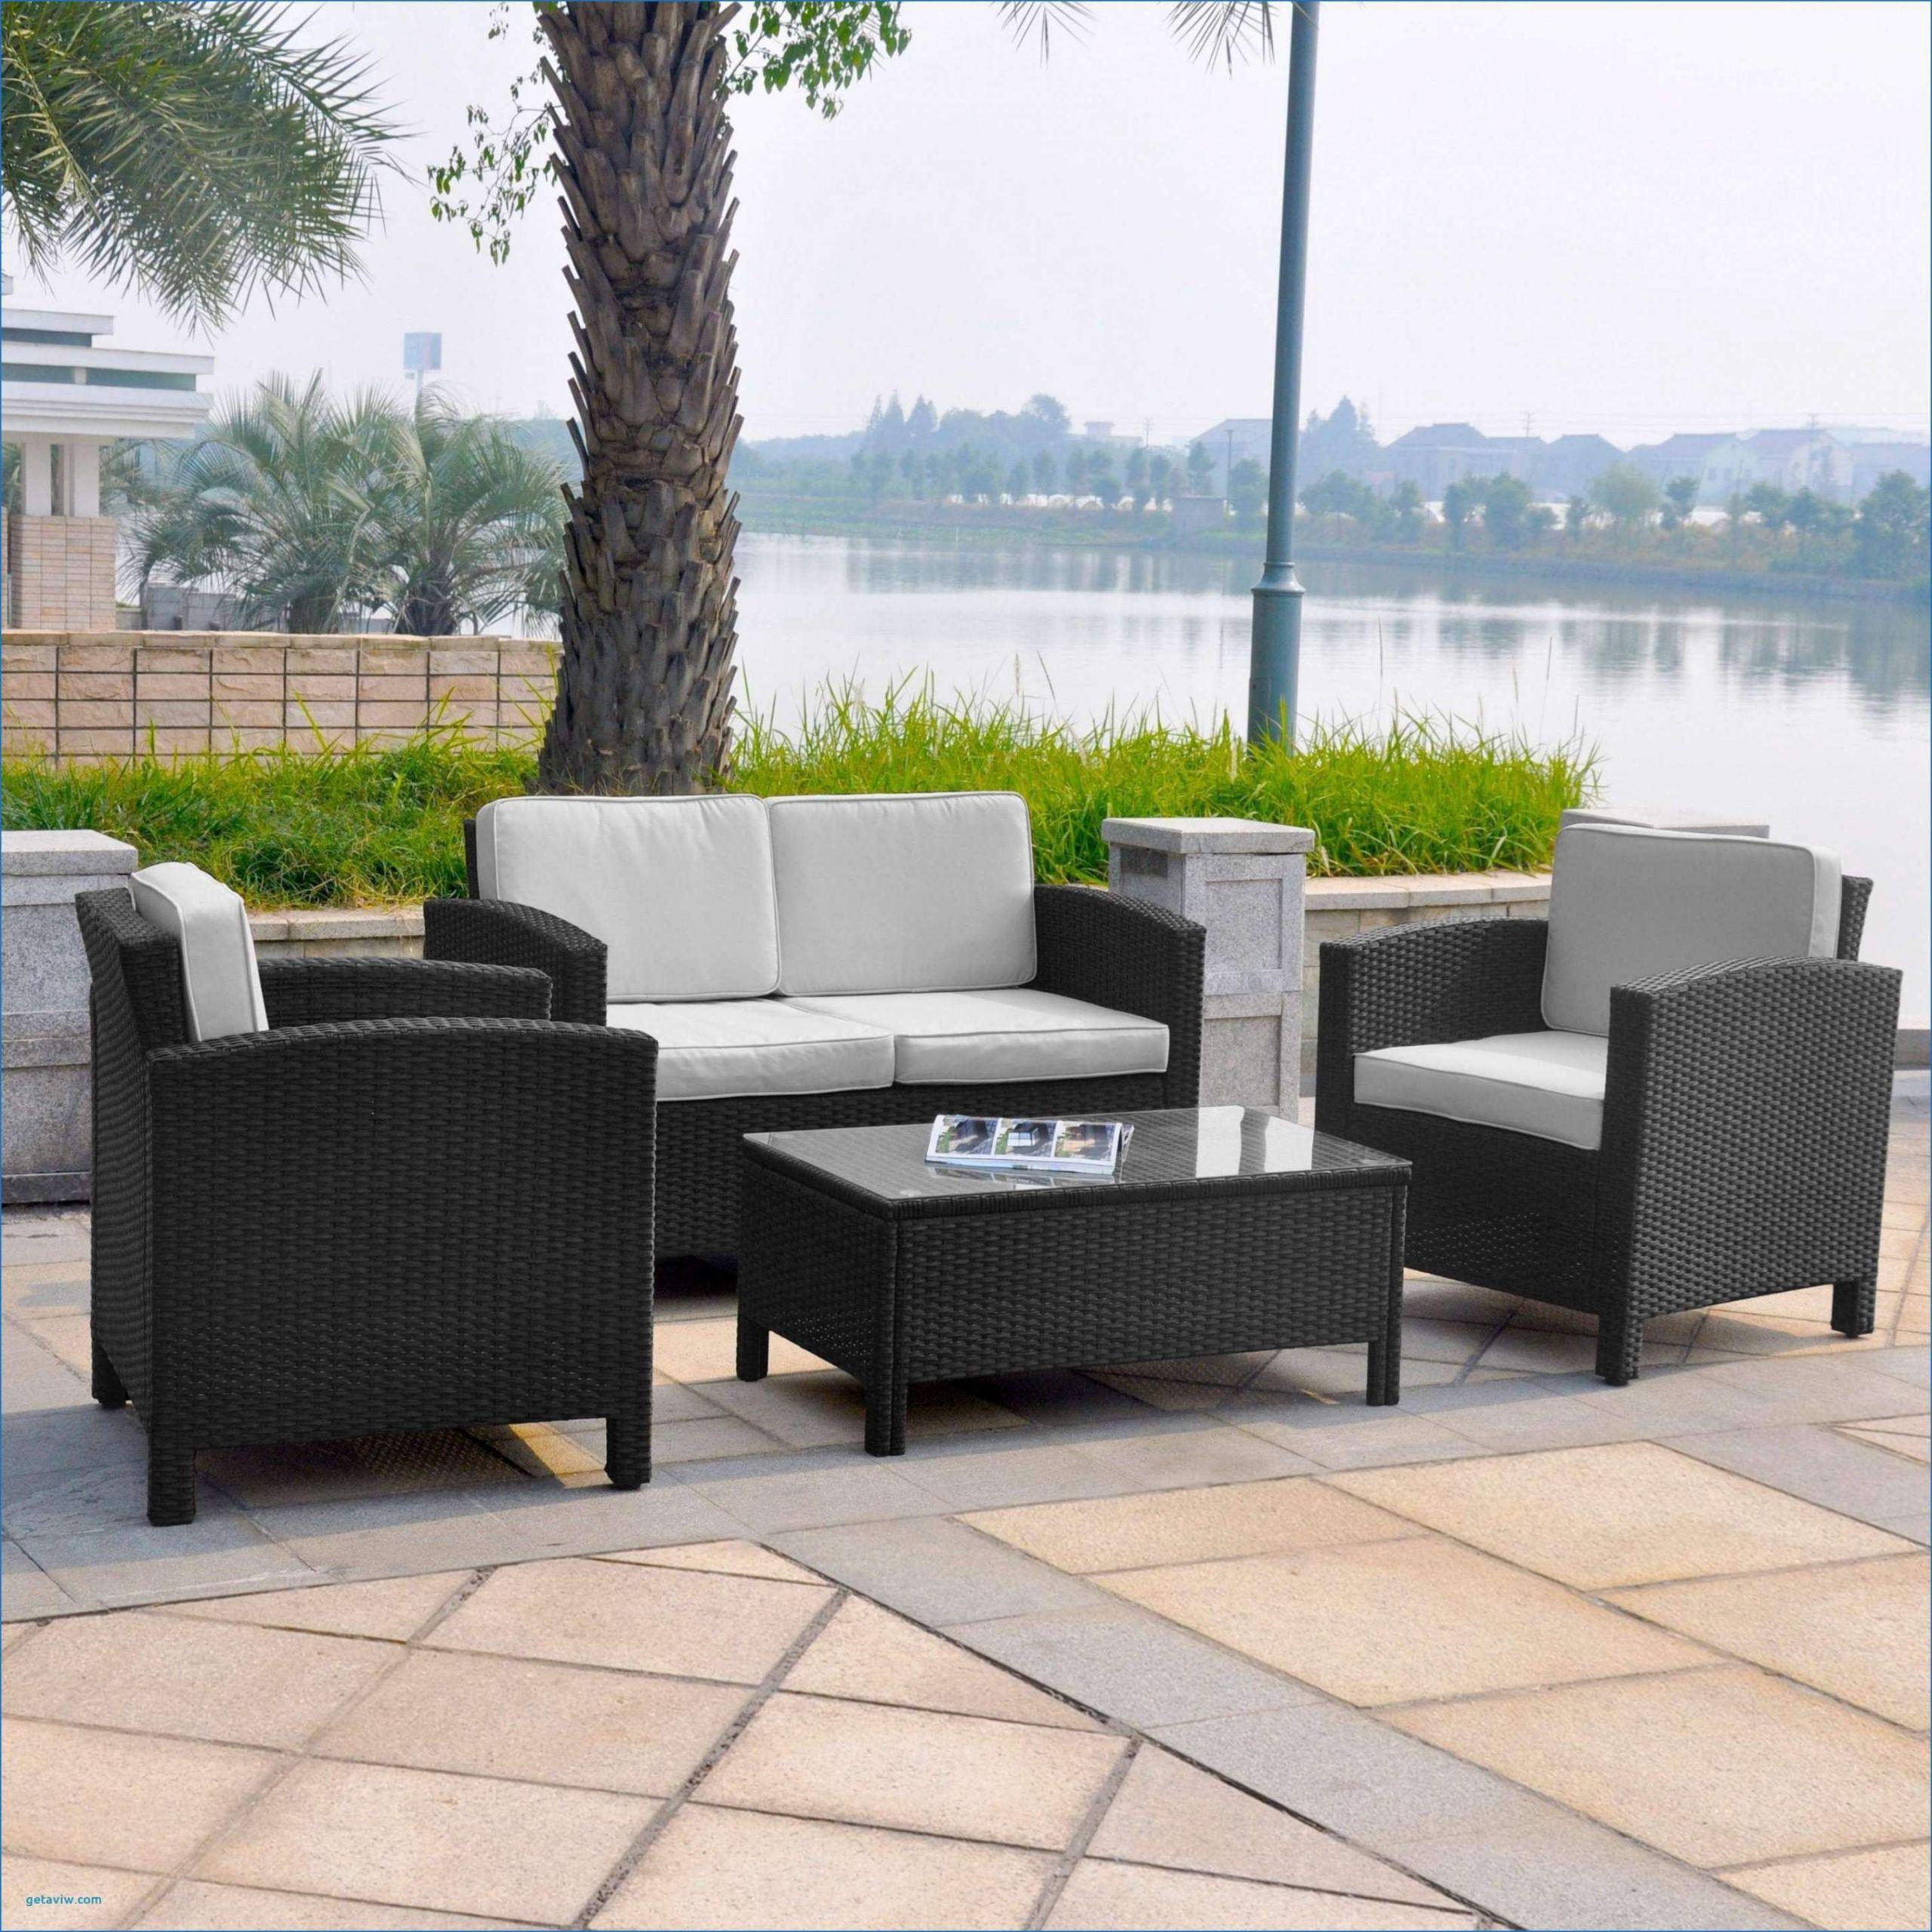 45 frisch loungemobel garten aluminium galerie bauhaus architektur mobel bauhaus architektur mobel